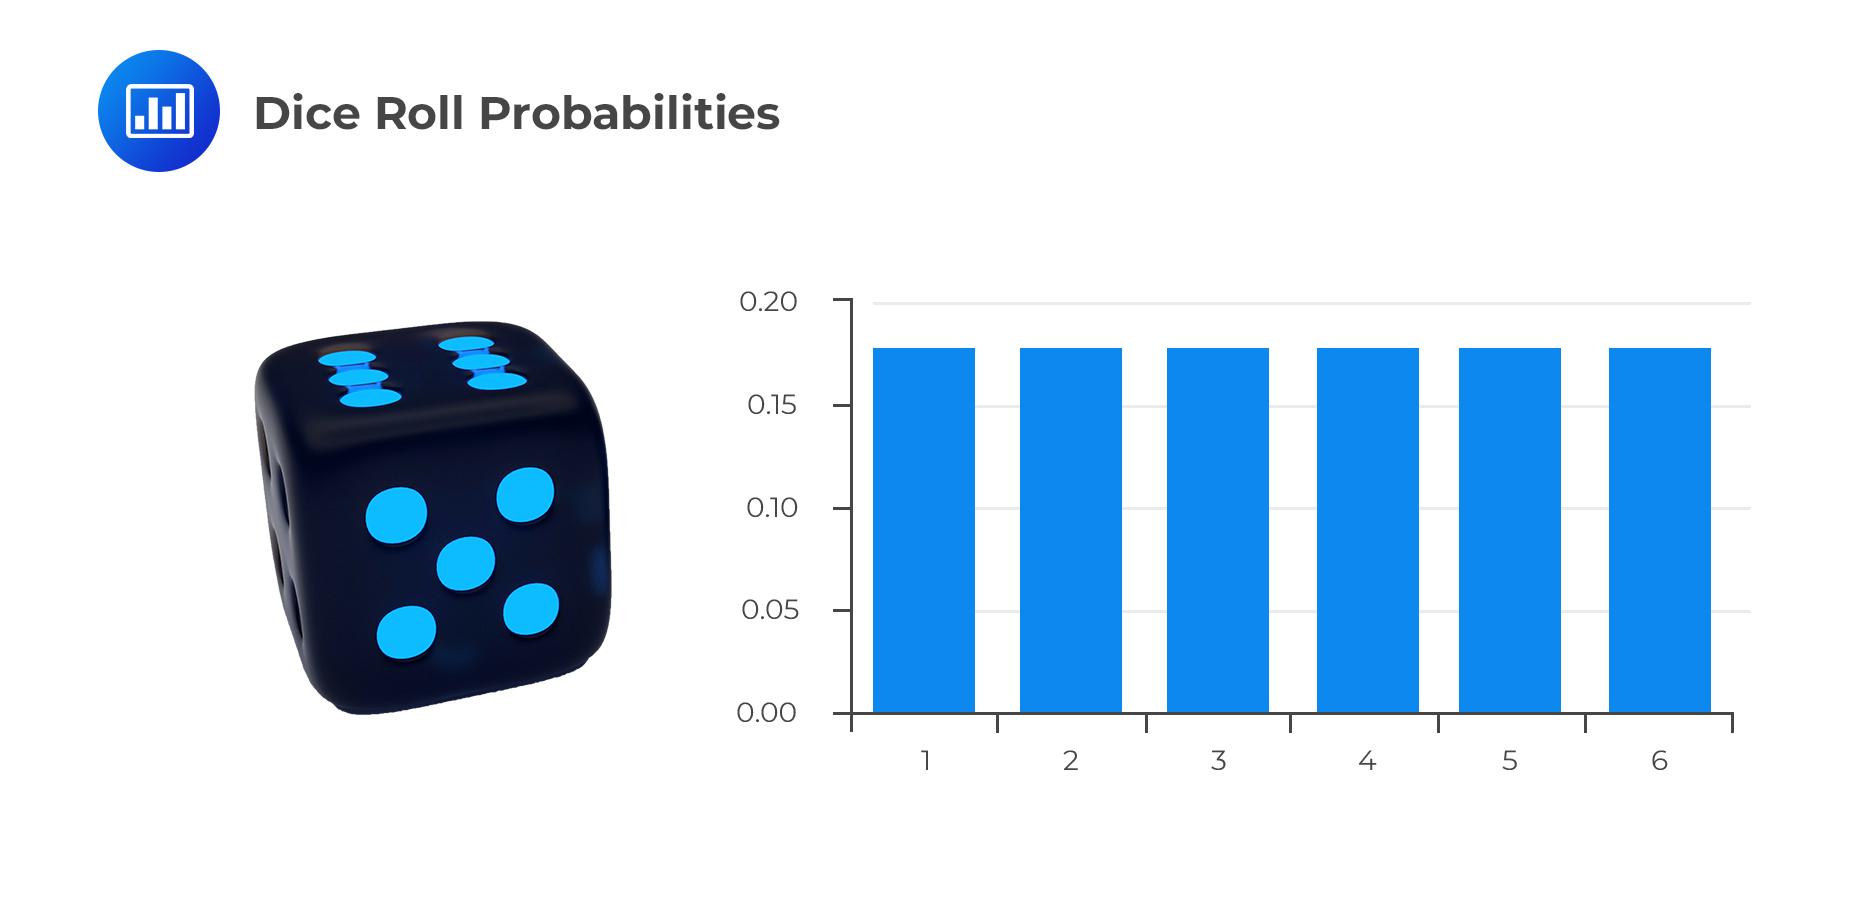 Dice Roll Probabilities